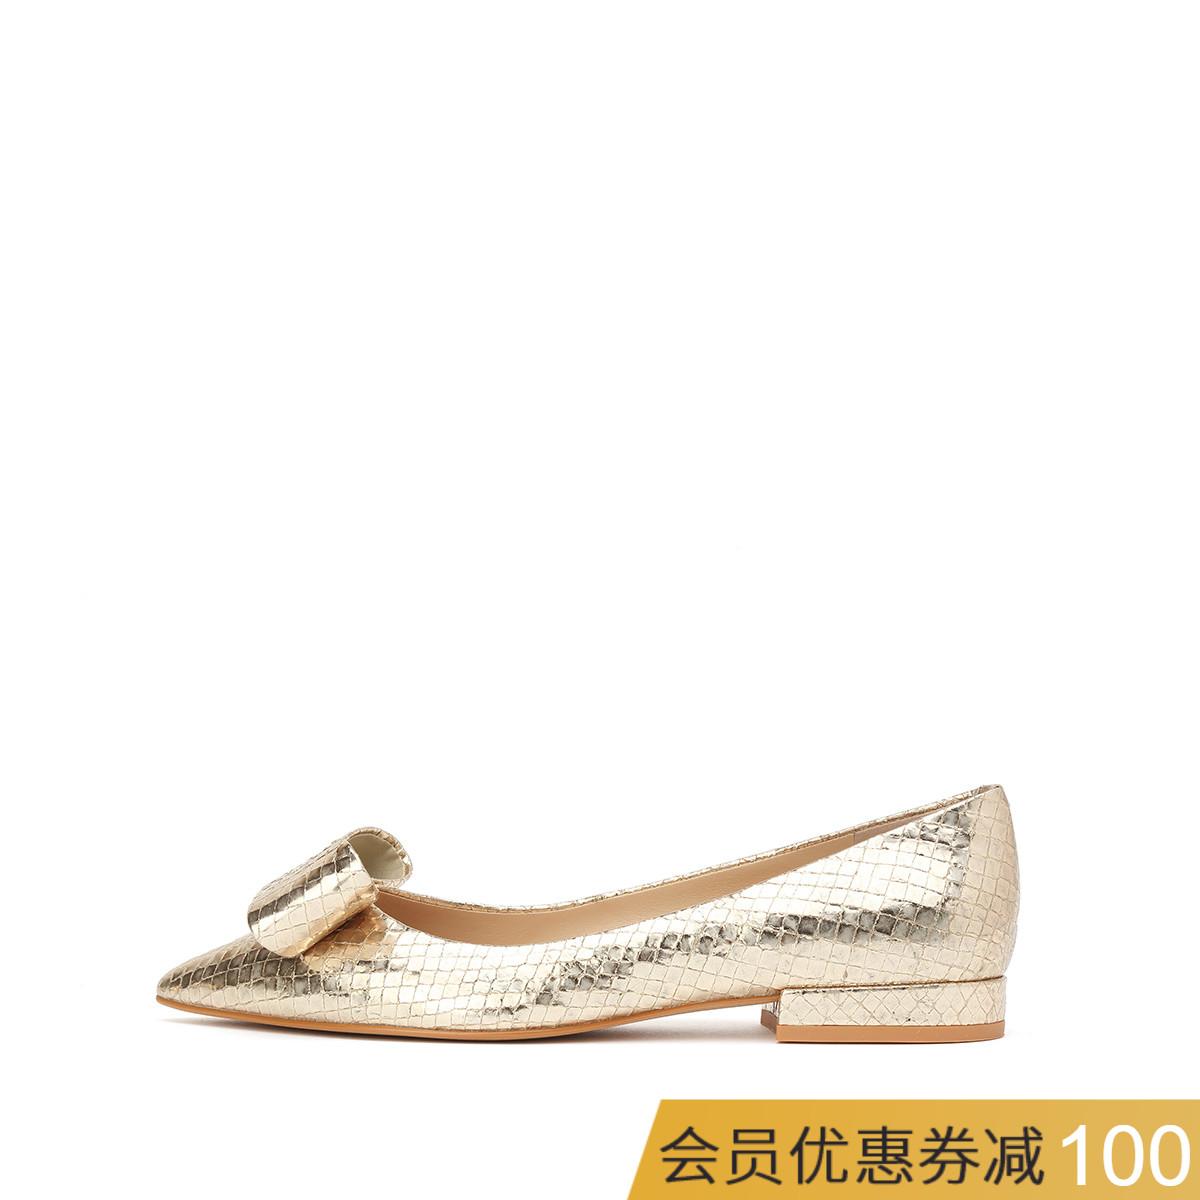 WHAT FOR2018夏羊皮平底尖头新款蝴蝶结低跟银色鳄鱼纹女浅口单鞋